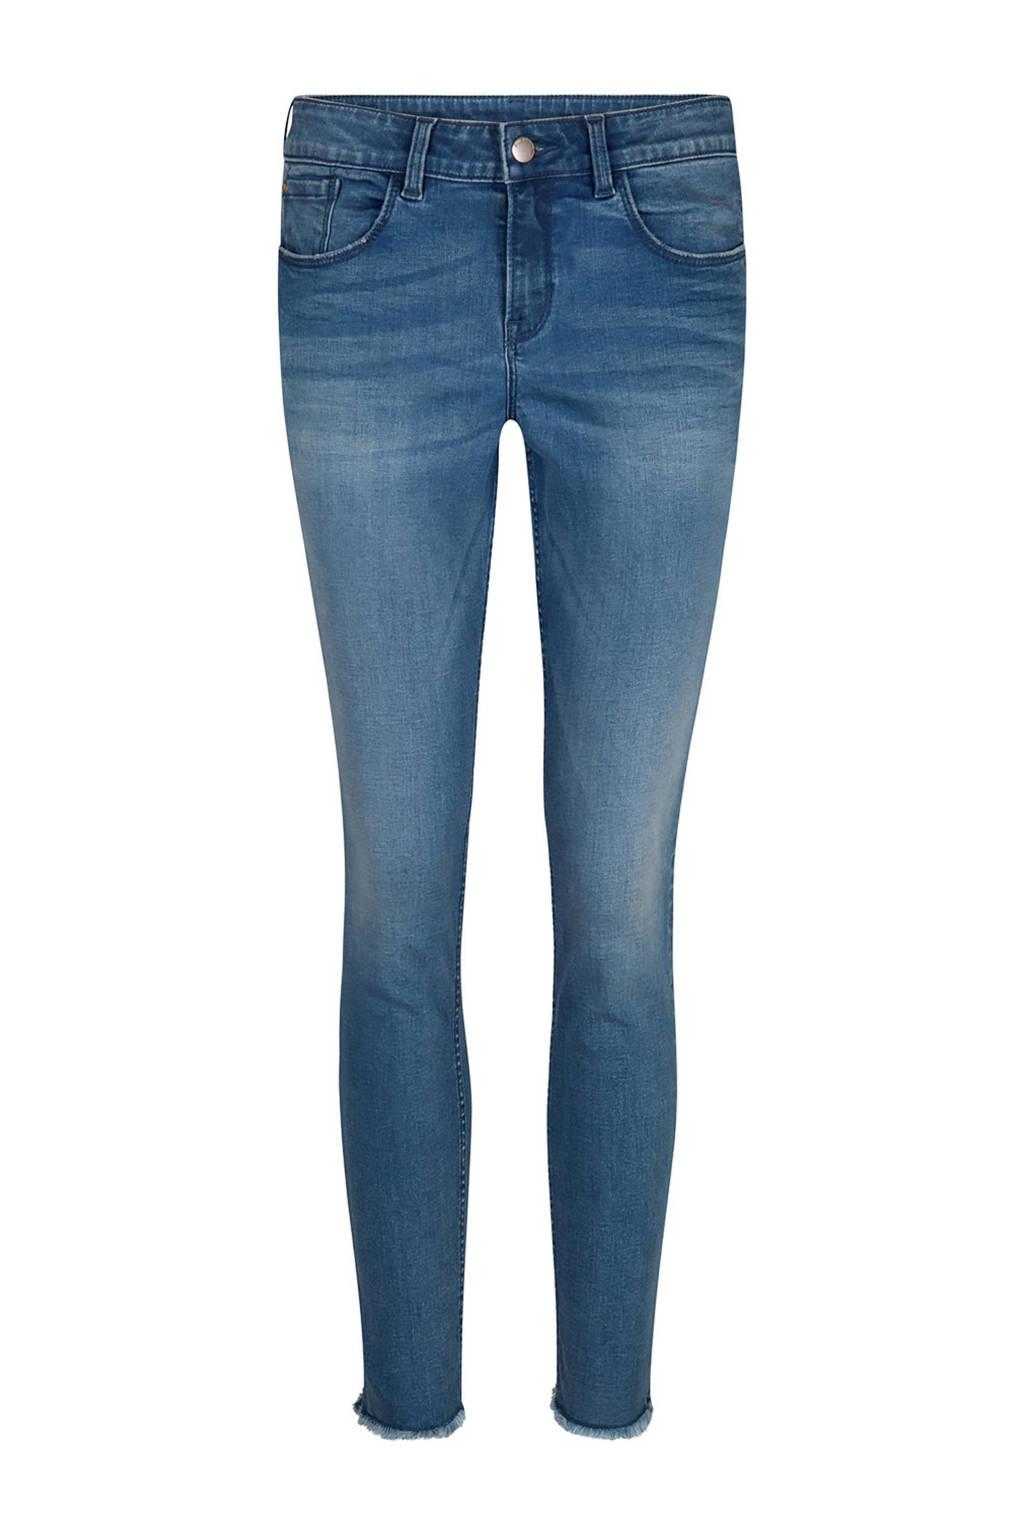 WE Fashion Blue Ridge skinny jeans, Light denim